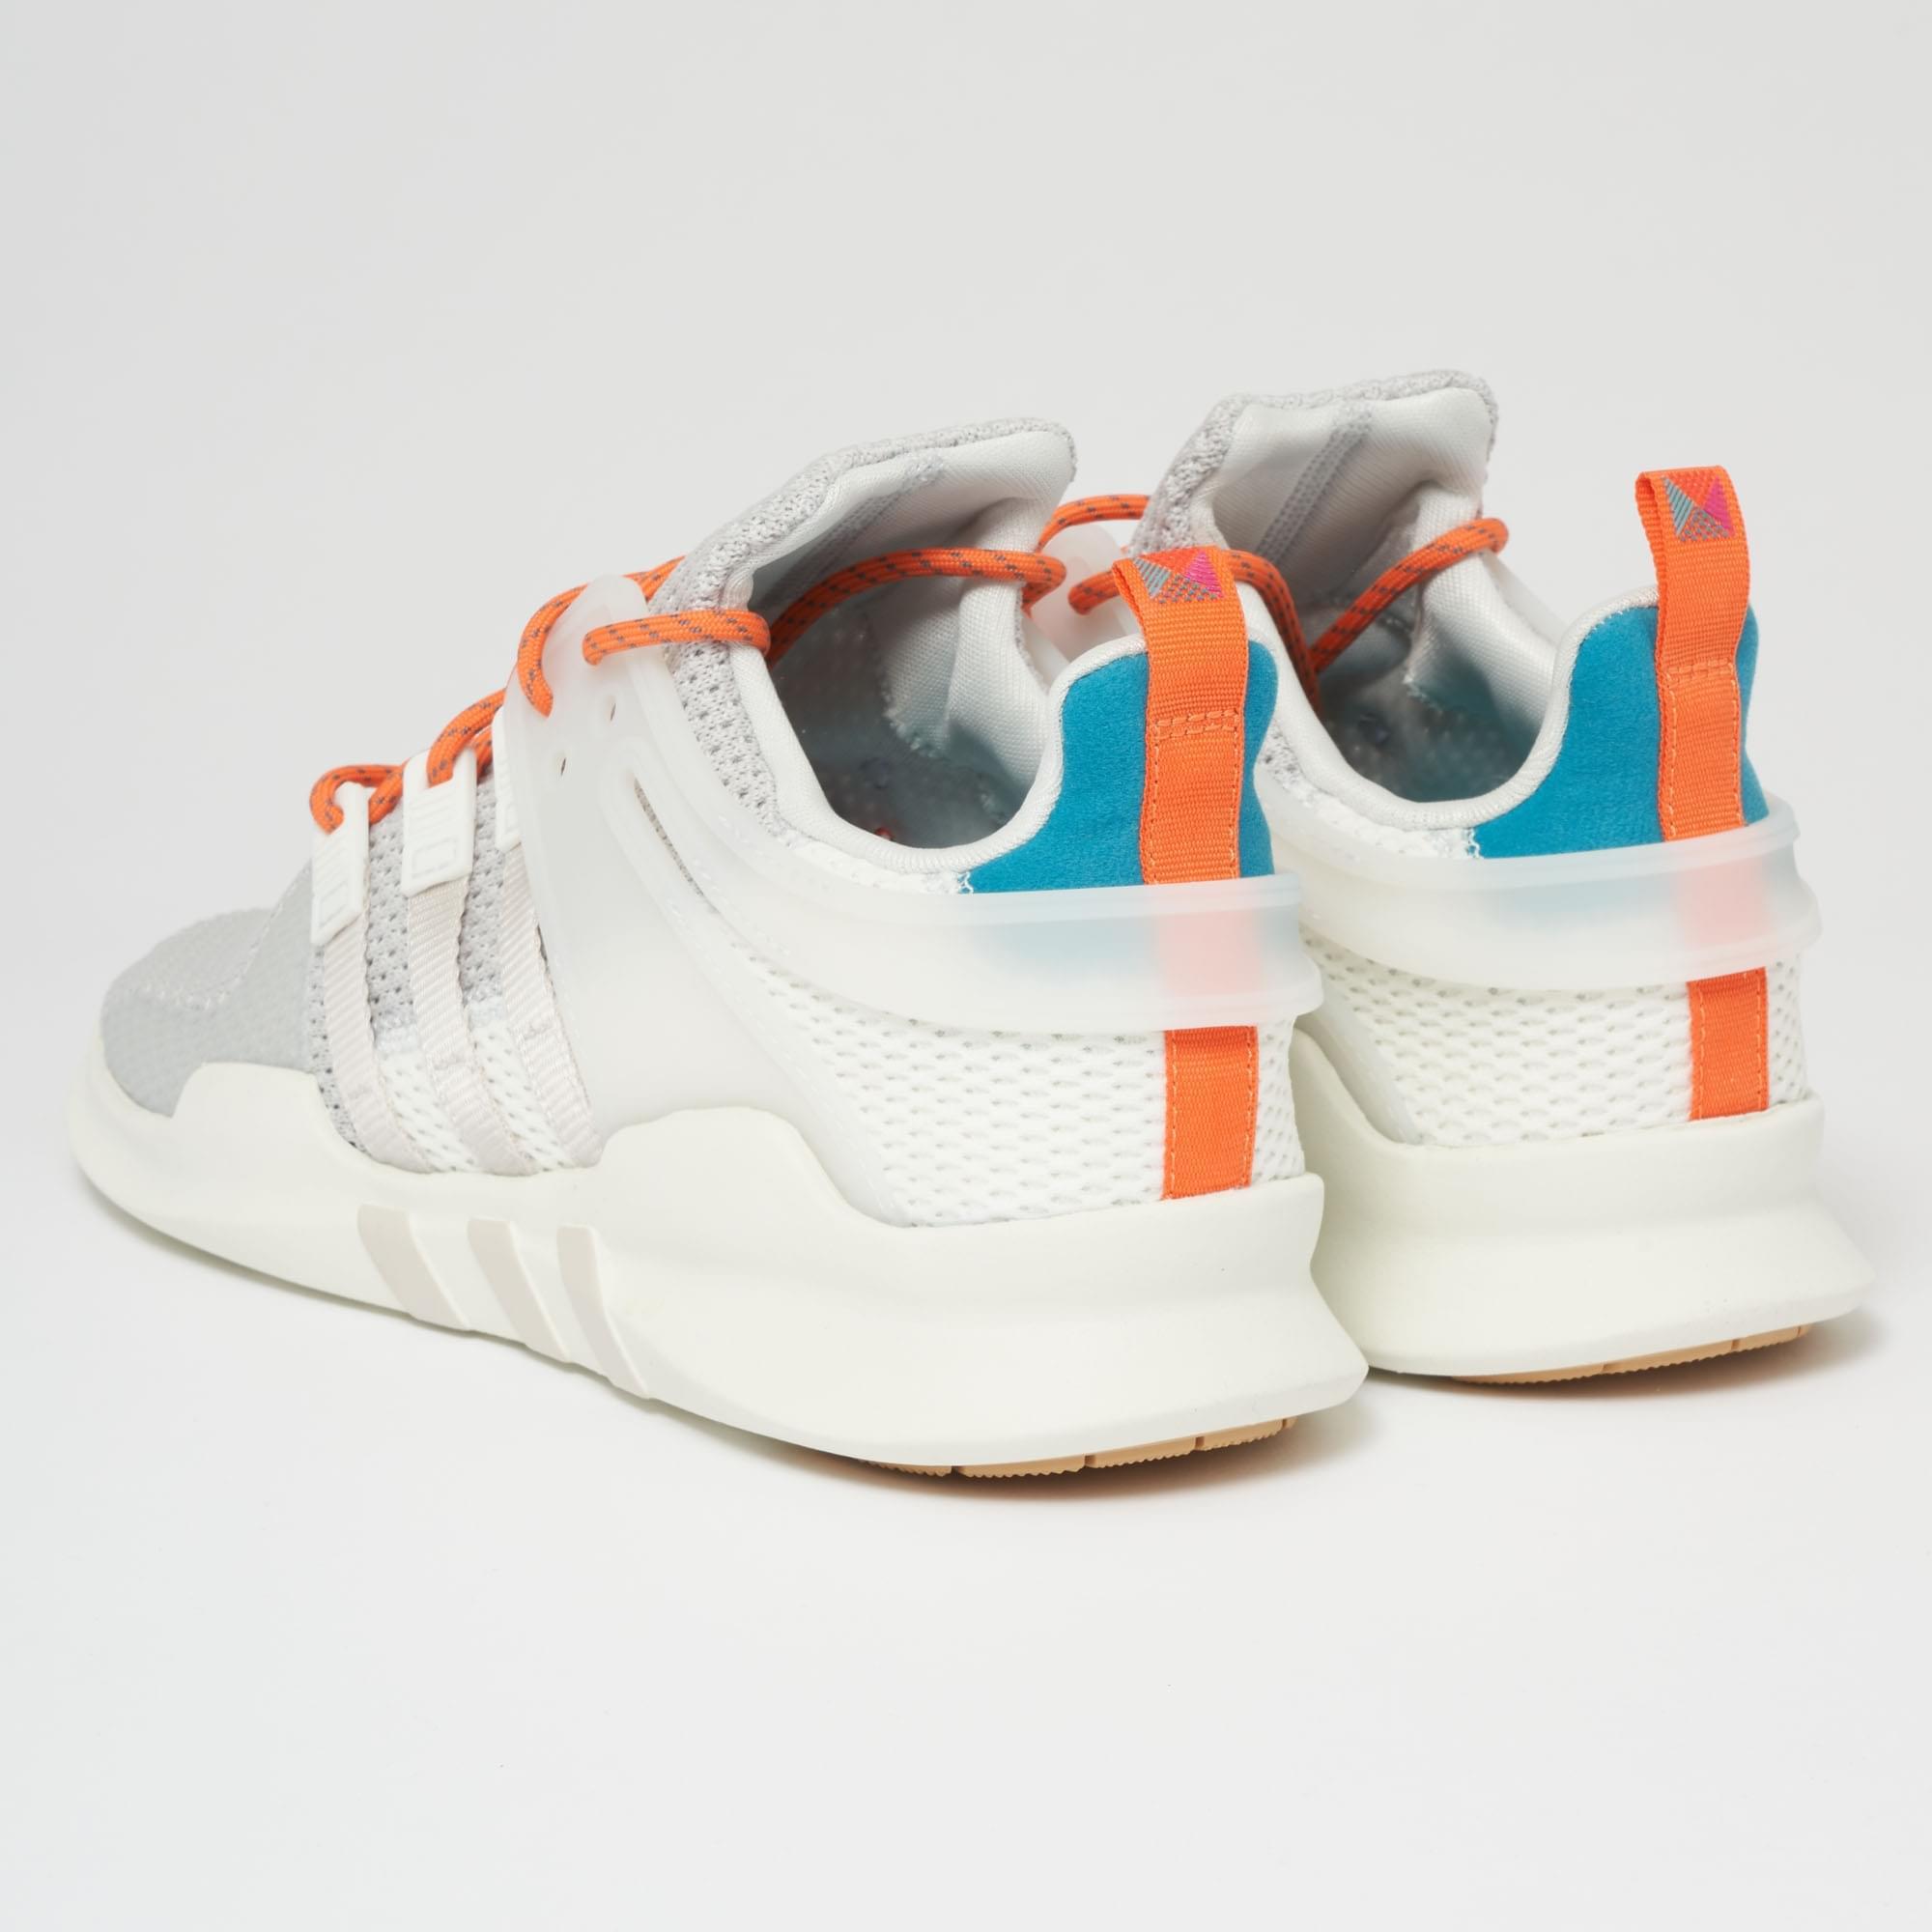 Lyst - adidas Originals Eqt Support Adv Summer - White Tint   Chalk ... 9520053a8